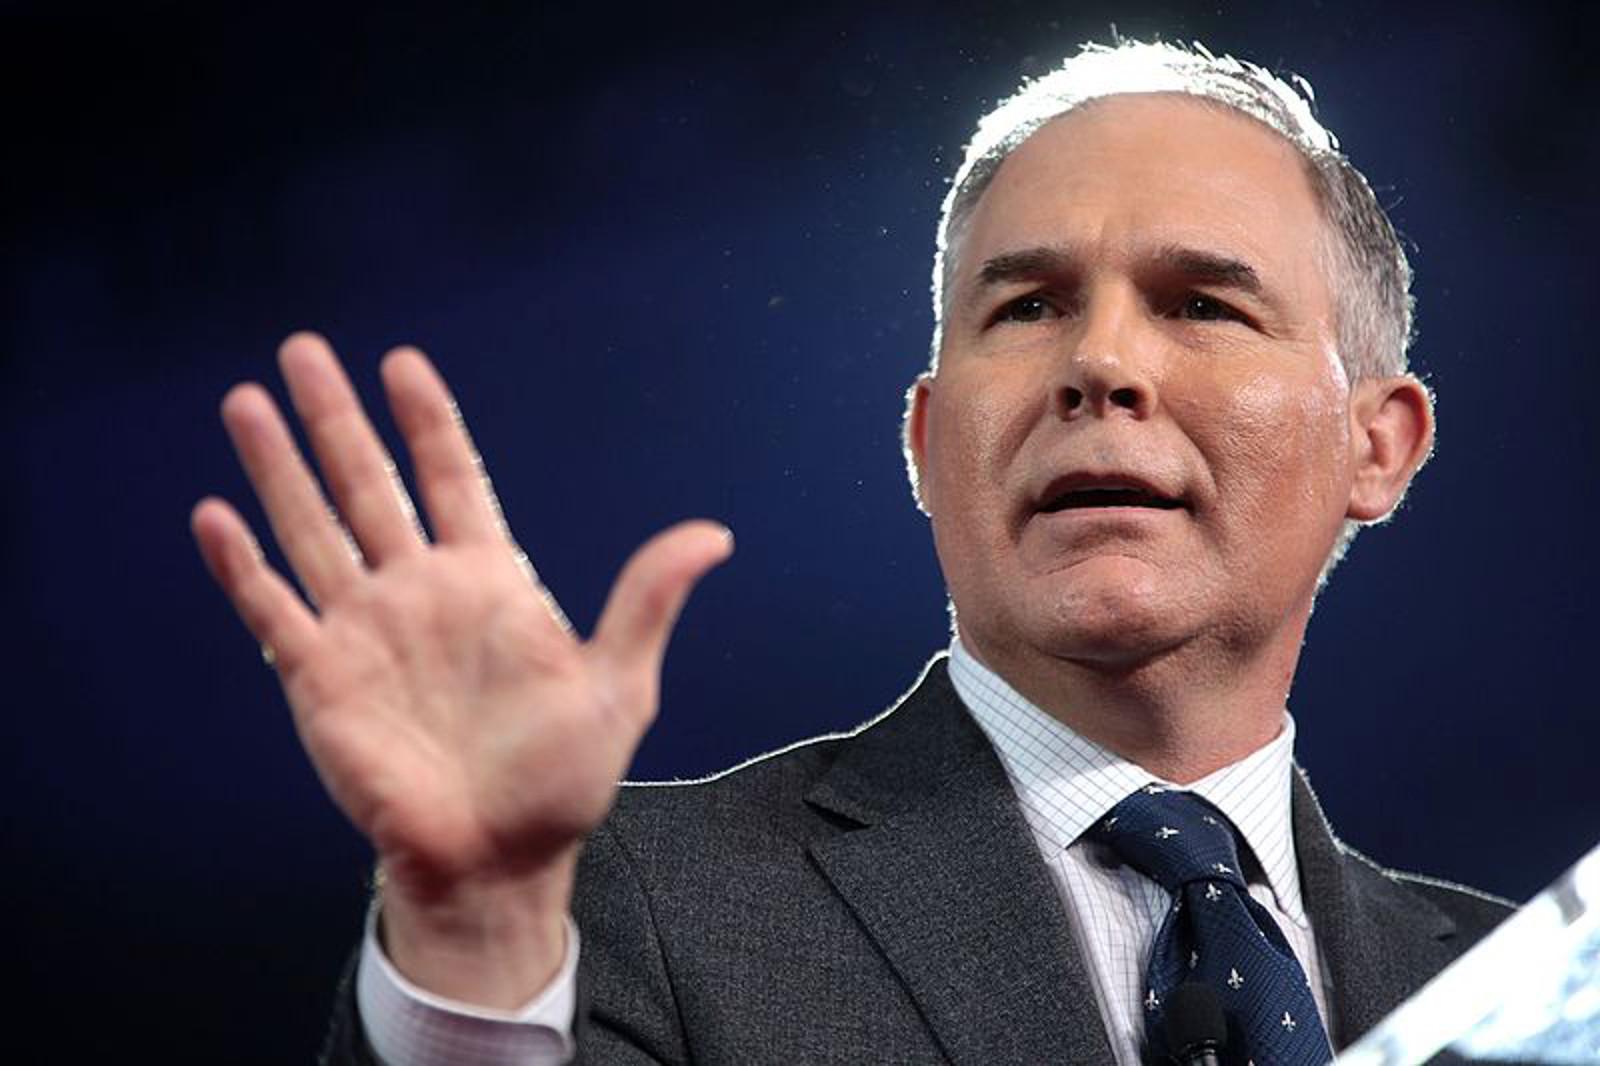 A recap of Scott Pruitt's first week at the EPA - and the news isn't good